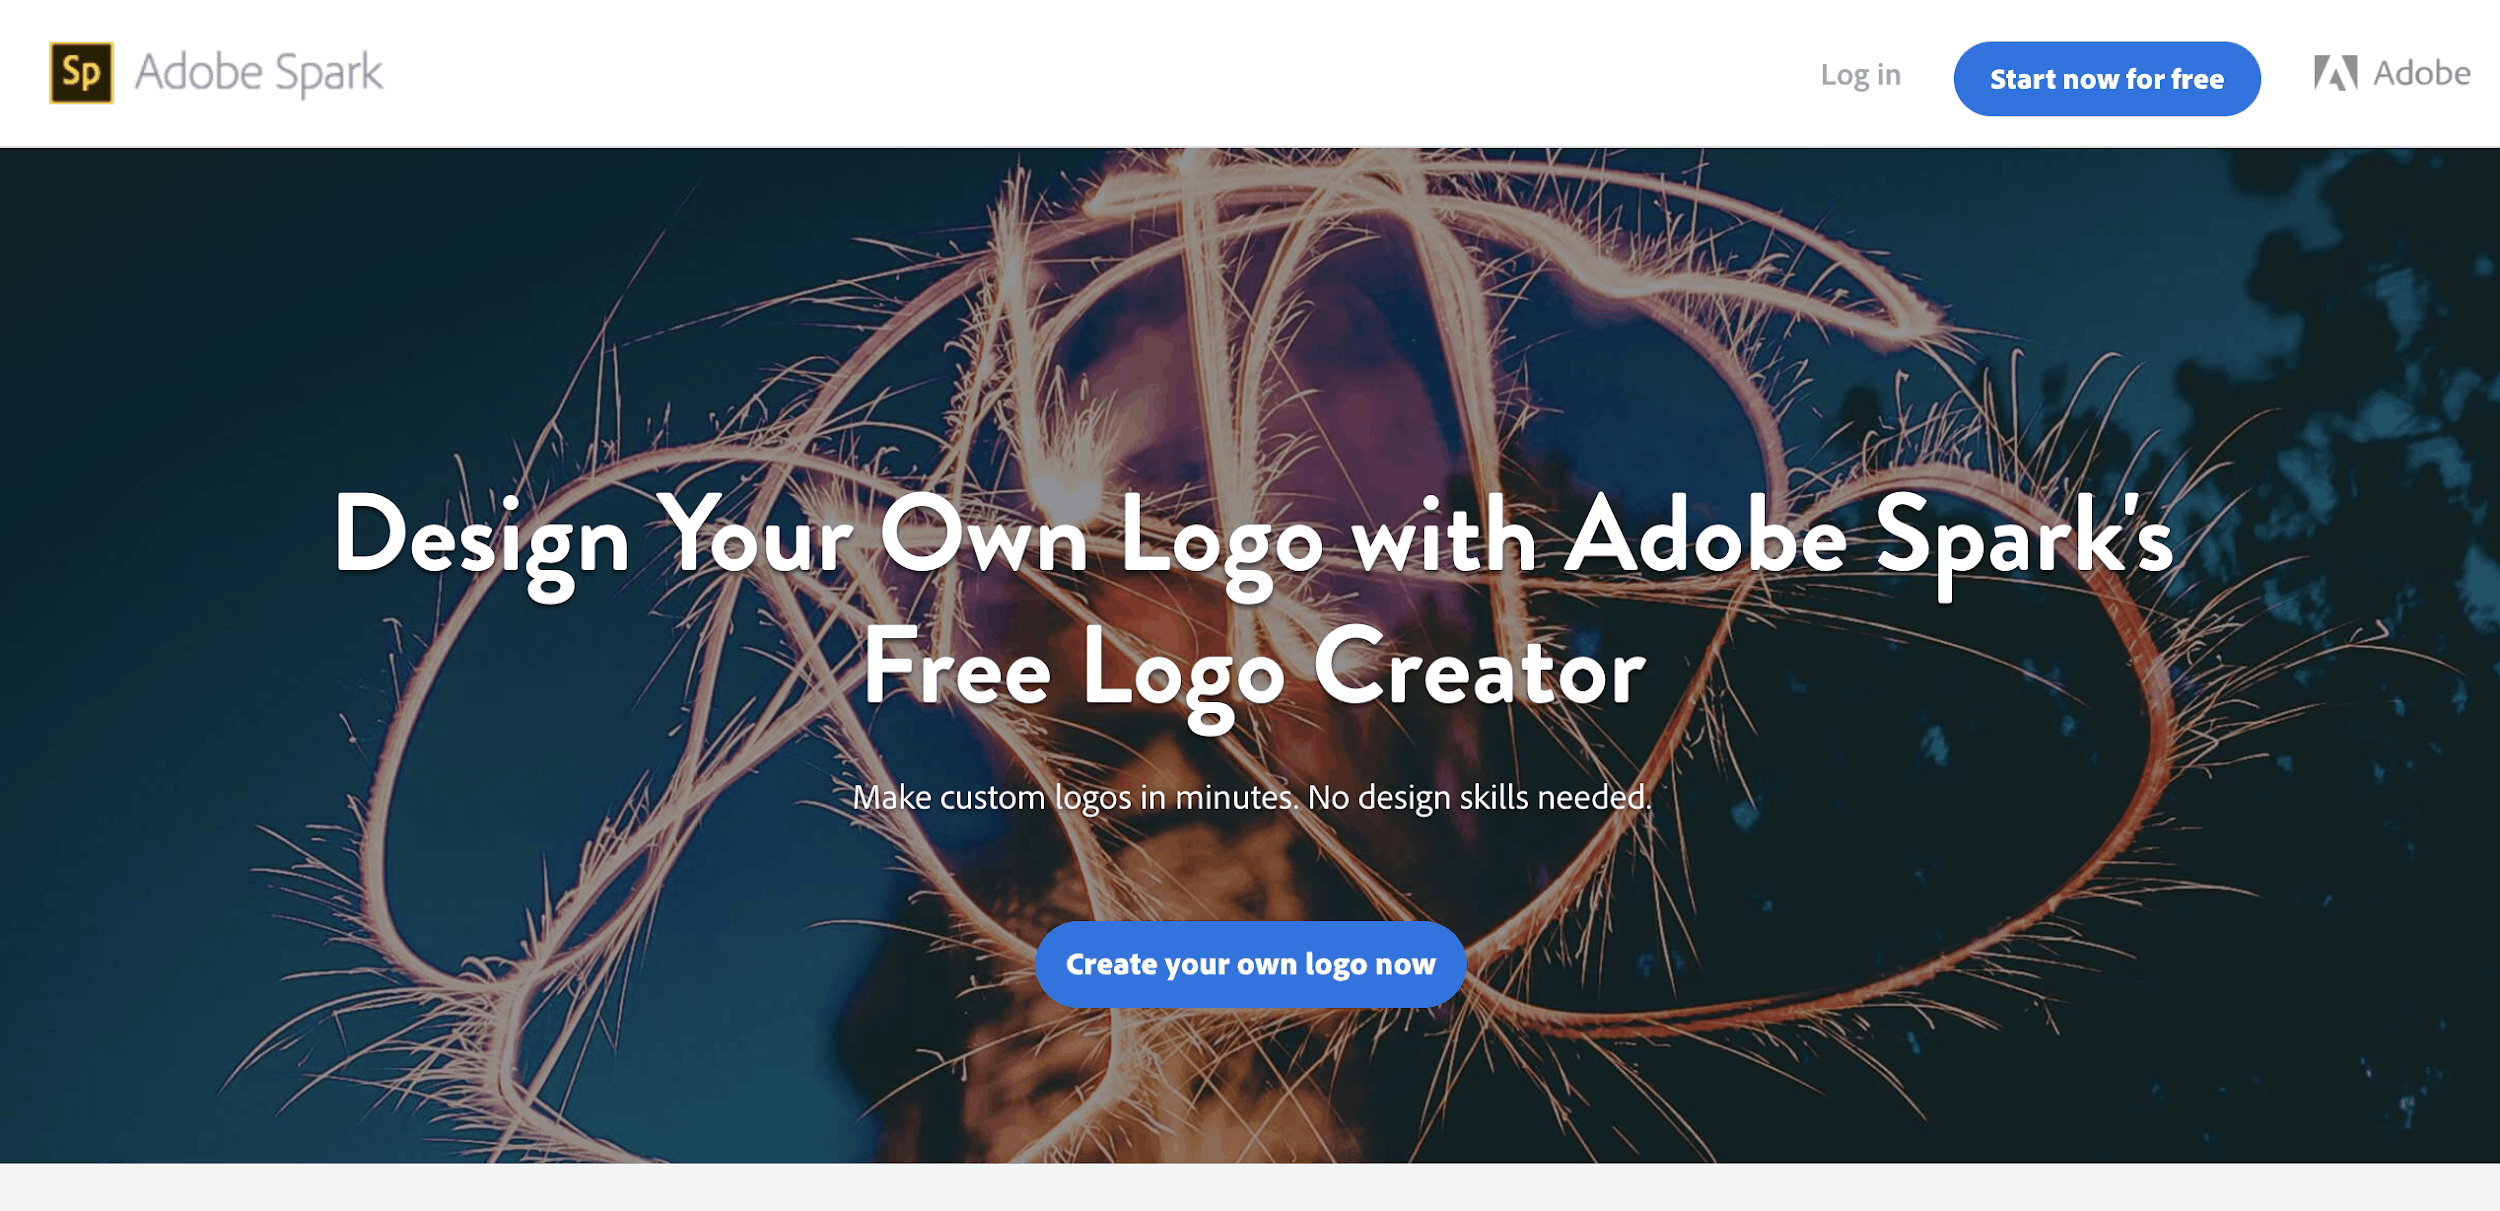 Adobe Spark free logo creator - homepage screenshot